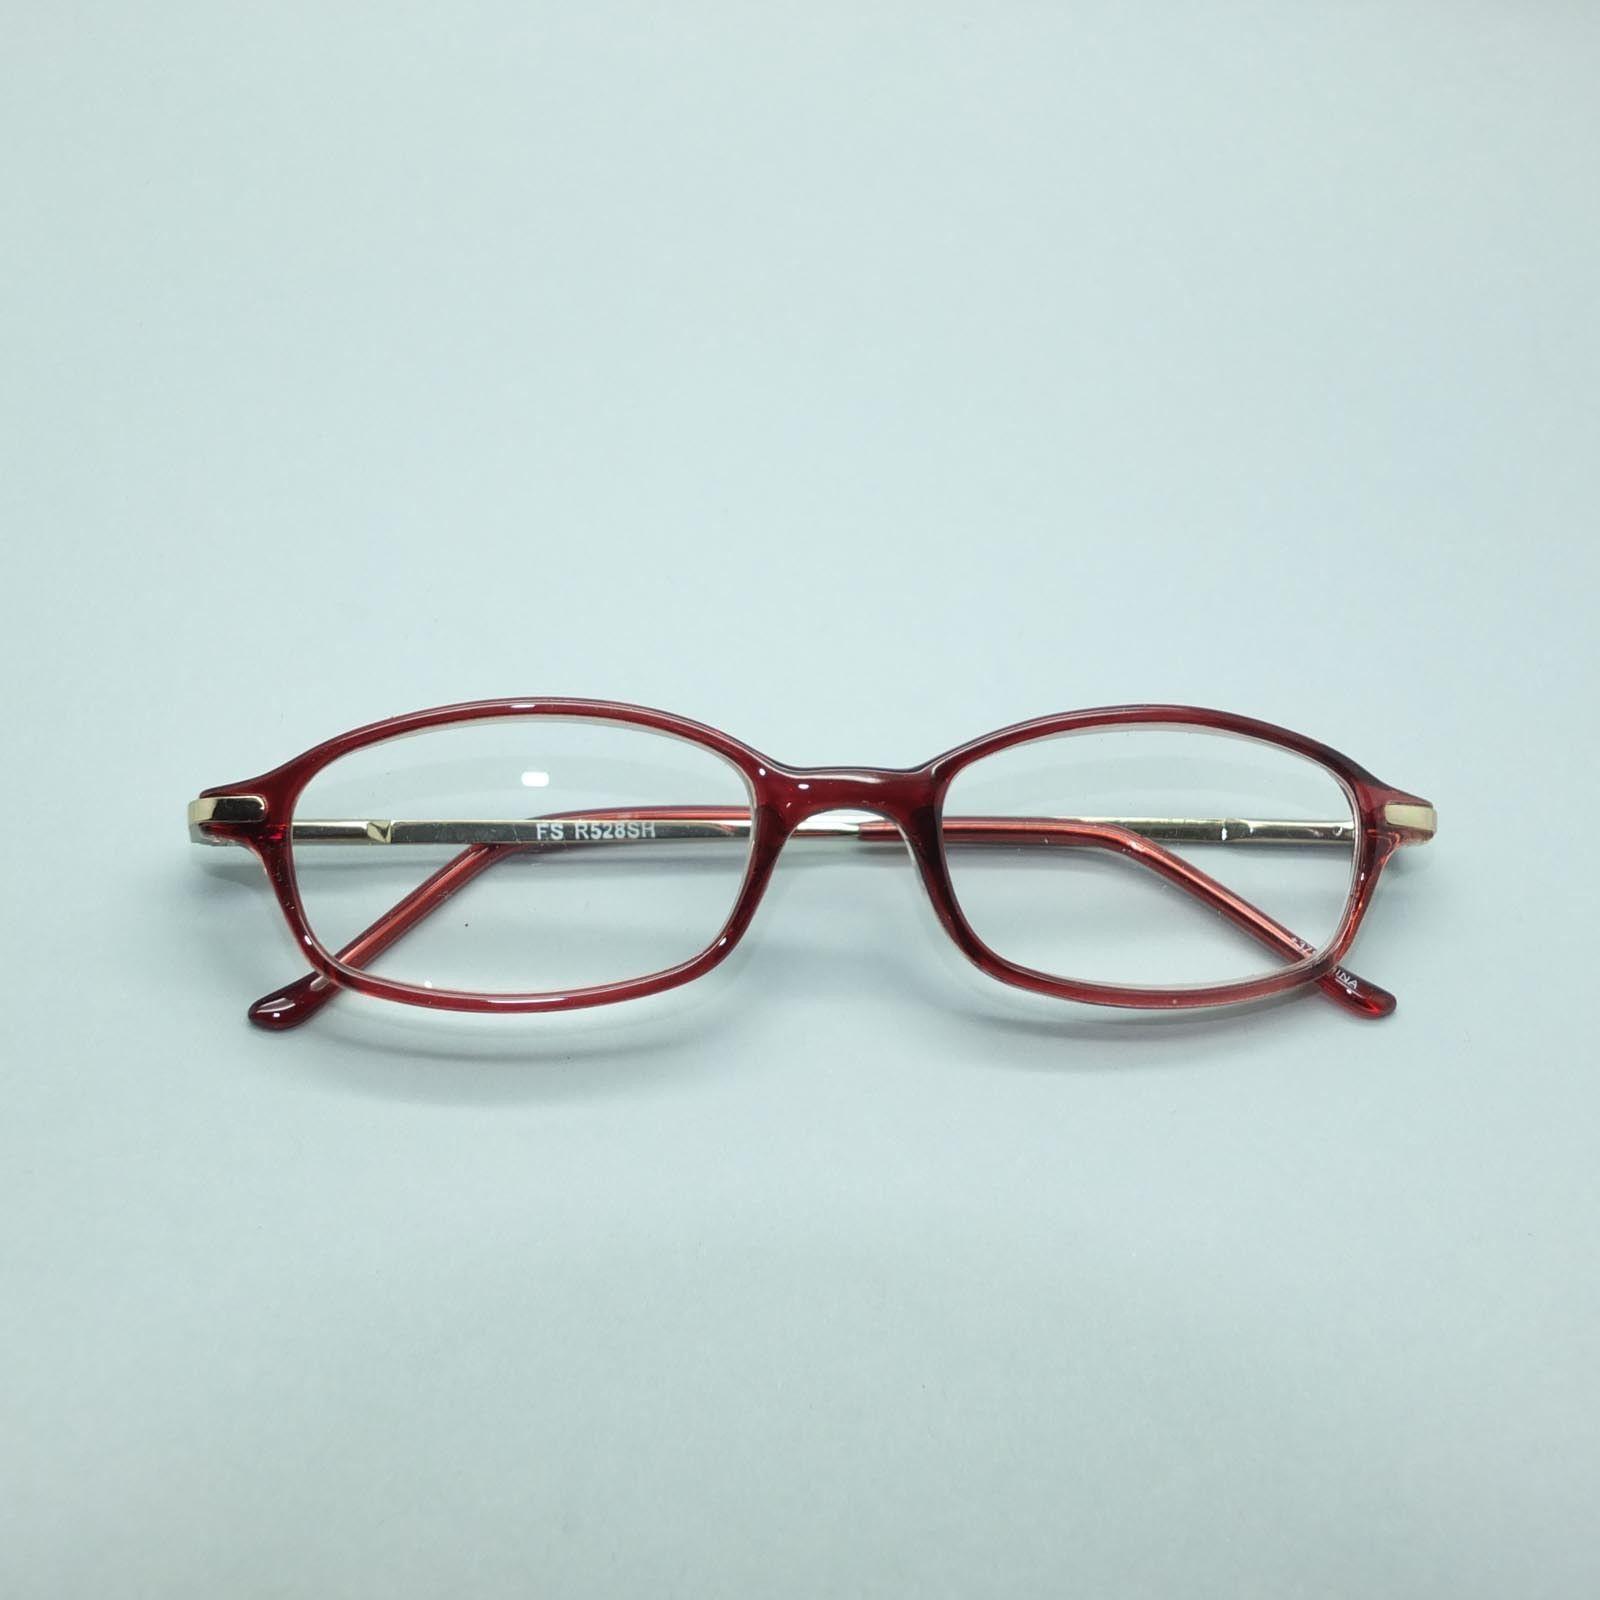 7fbec3b0f075 Reading Glasses 4.25 Strength